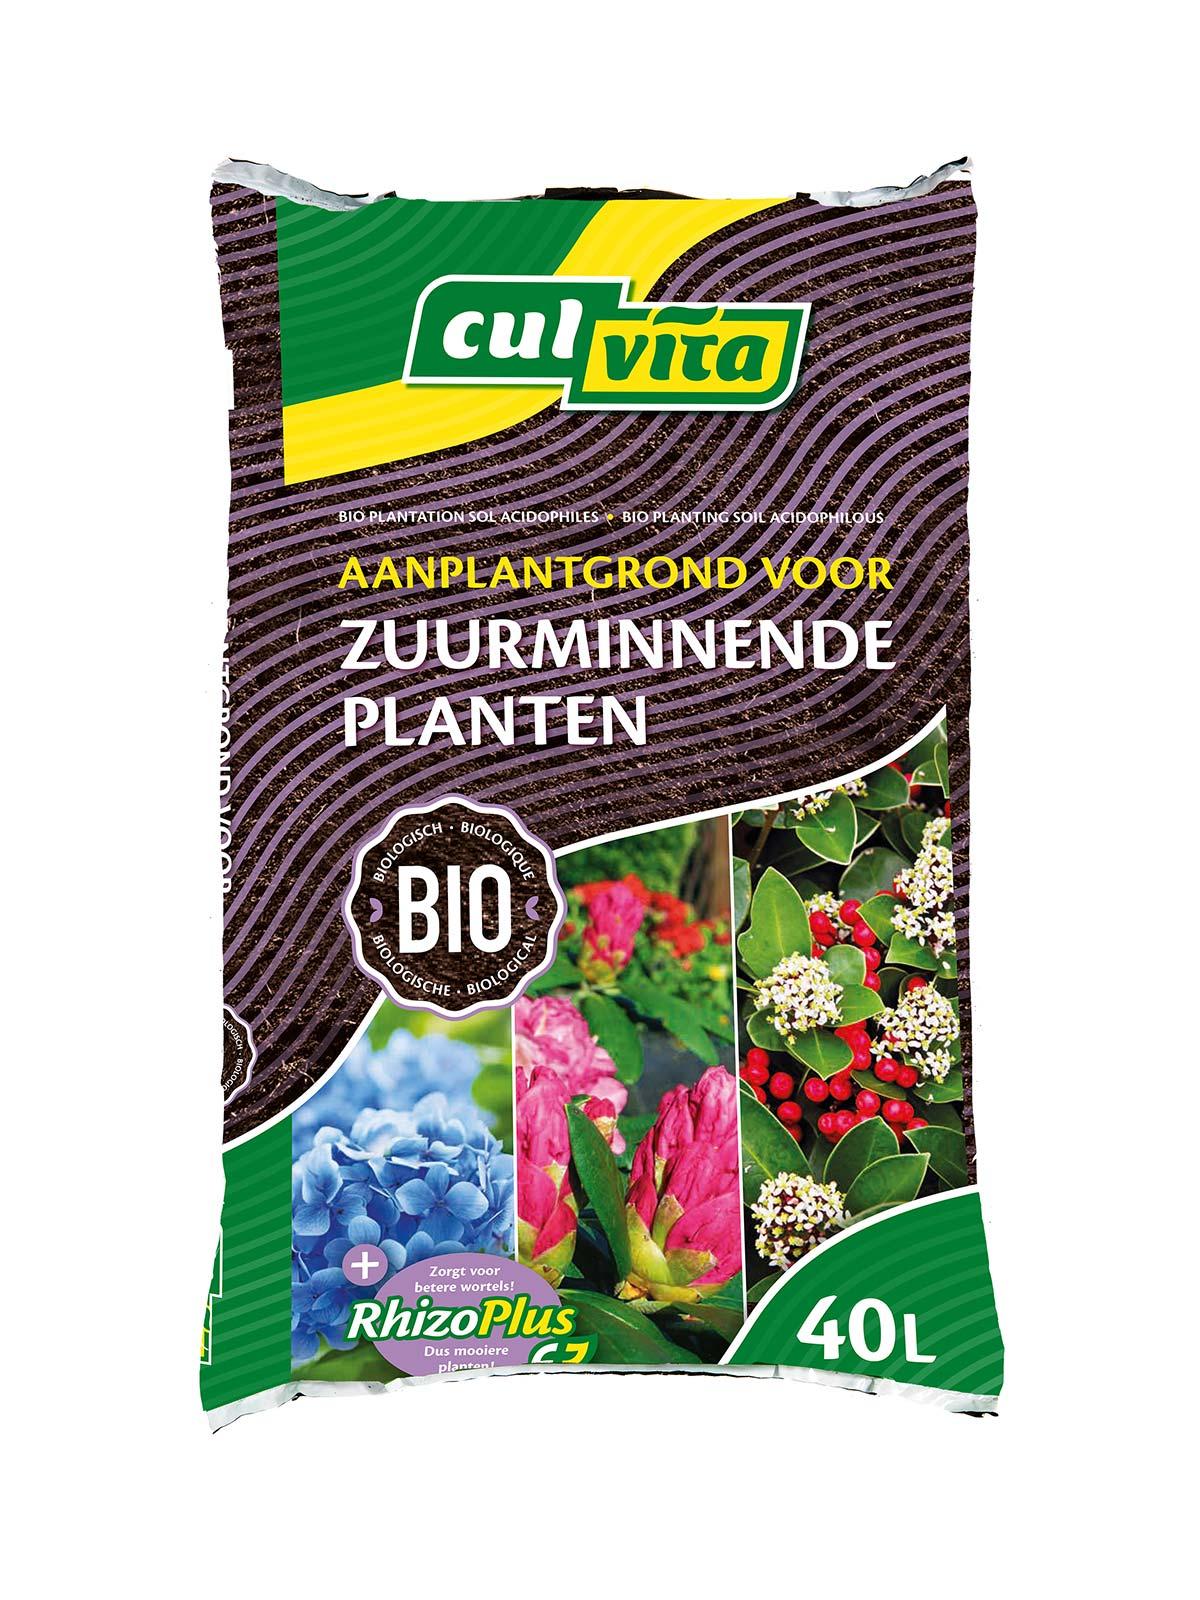 Culvita Aanplantgrond Voor Zuurminnende Planten | Culvita.nl